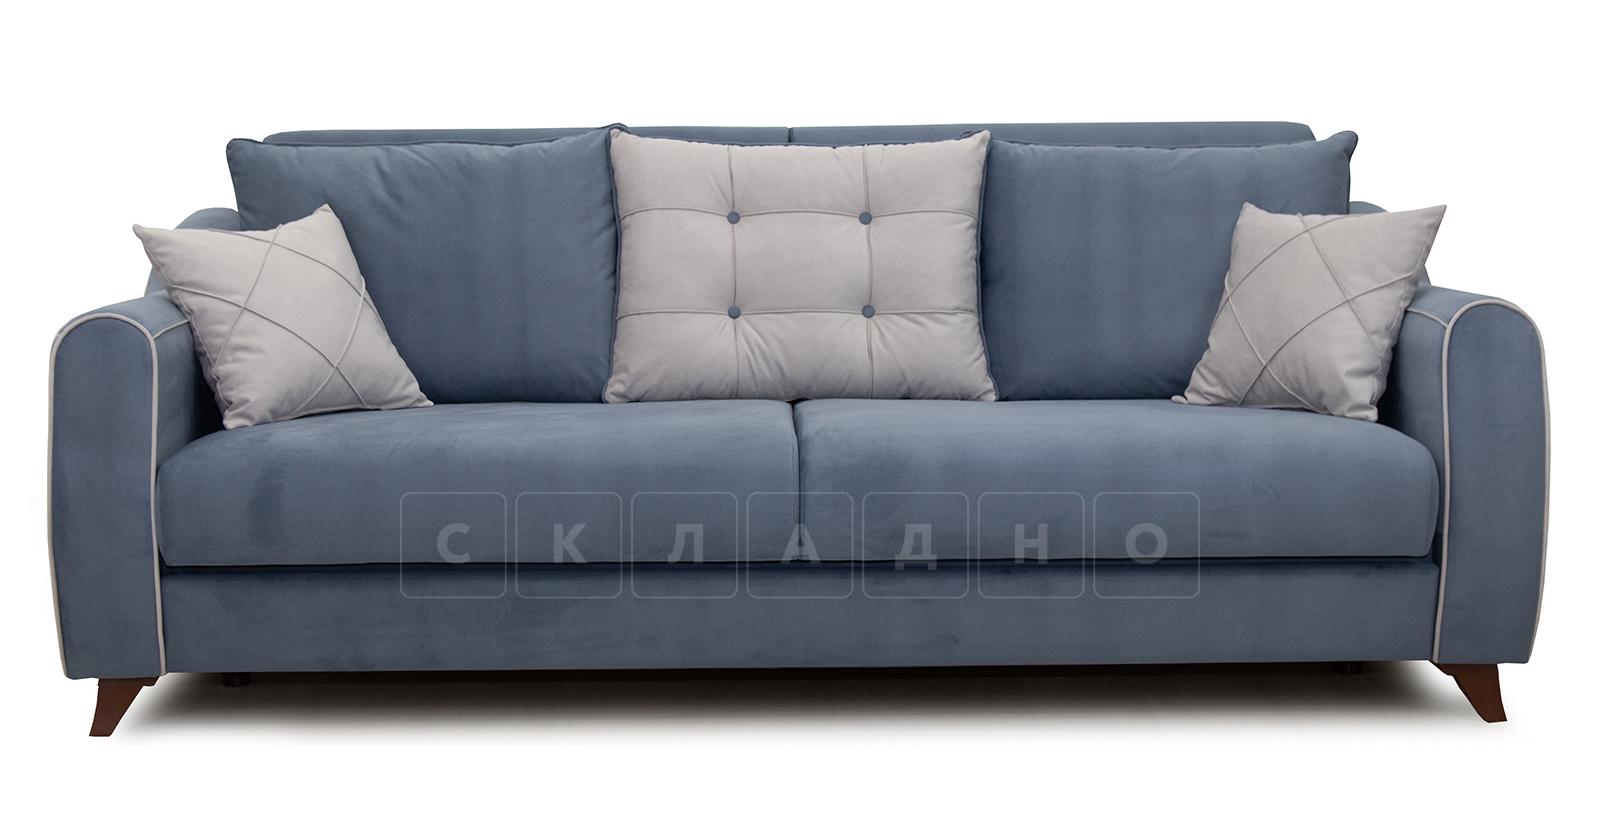 Диван-кровать Флэтфорд серо-синий фото 2 | интернет-магазин Складно